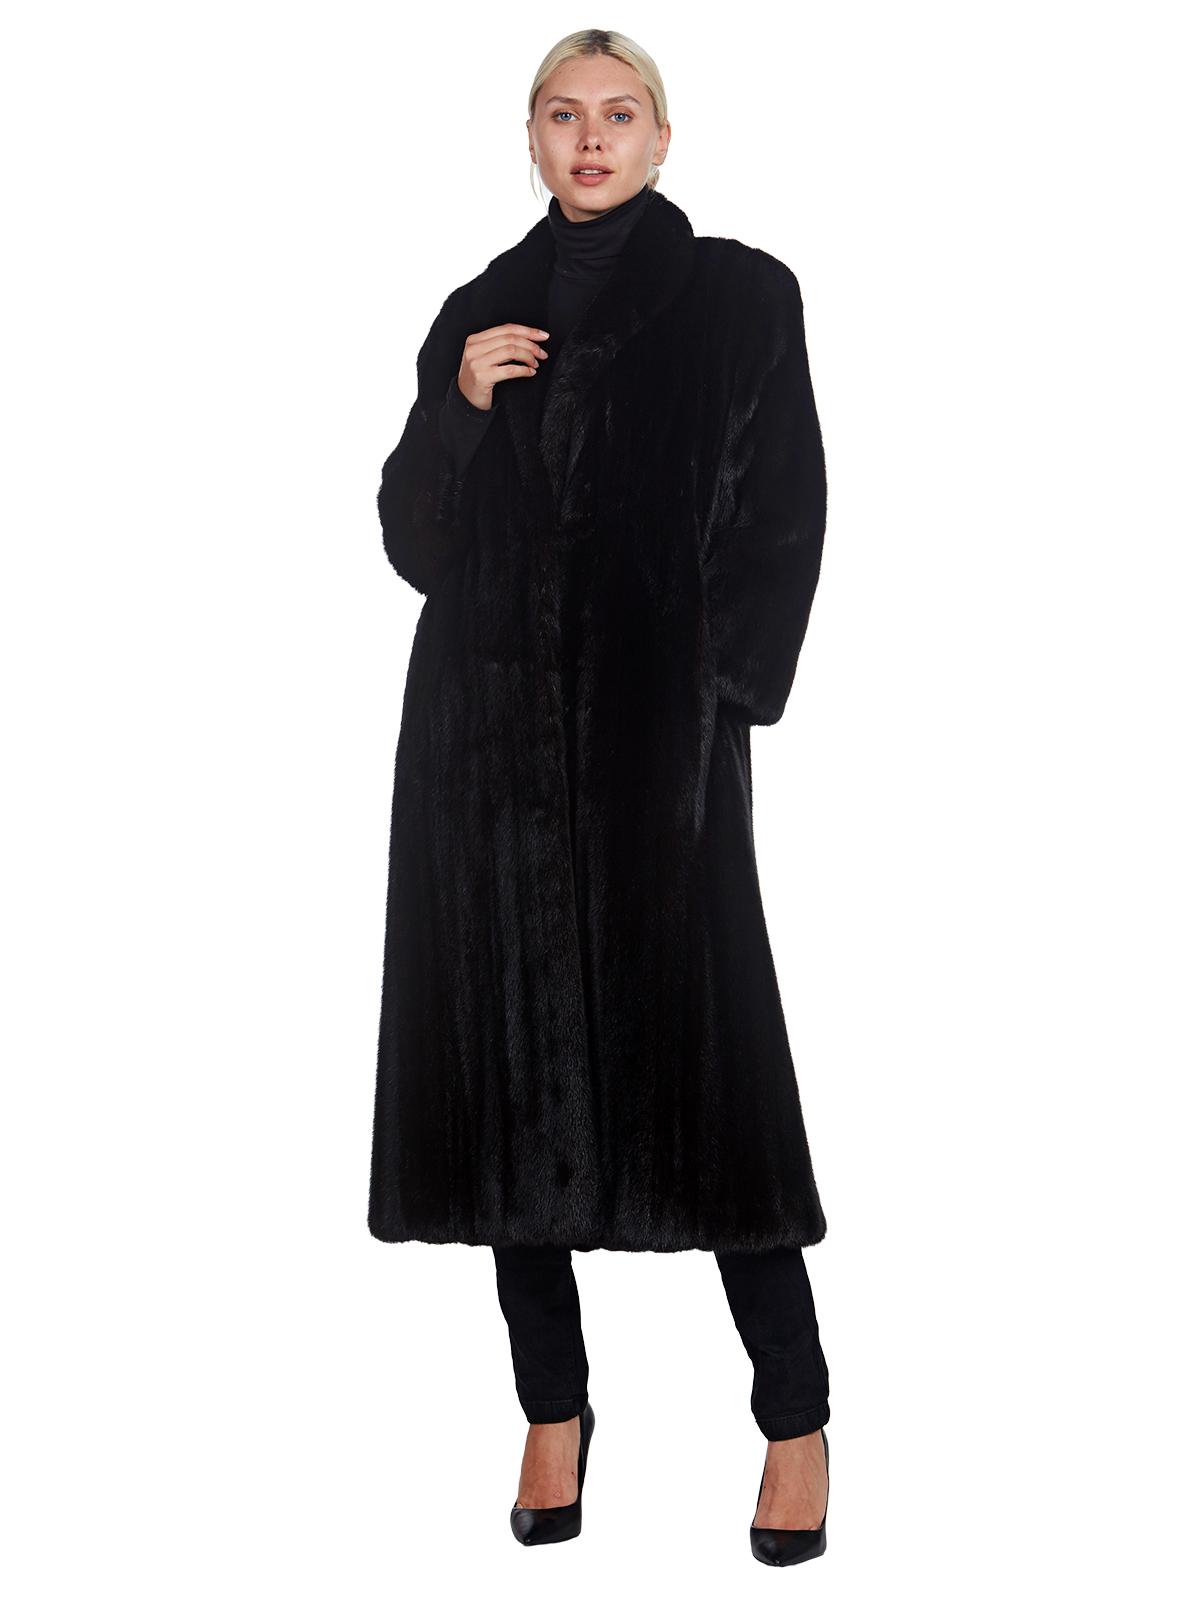 Woman's Full Length Dittrich Ranch Mink Fur Coat